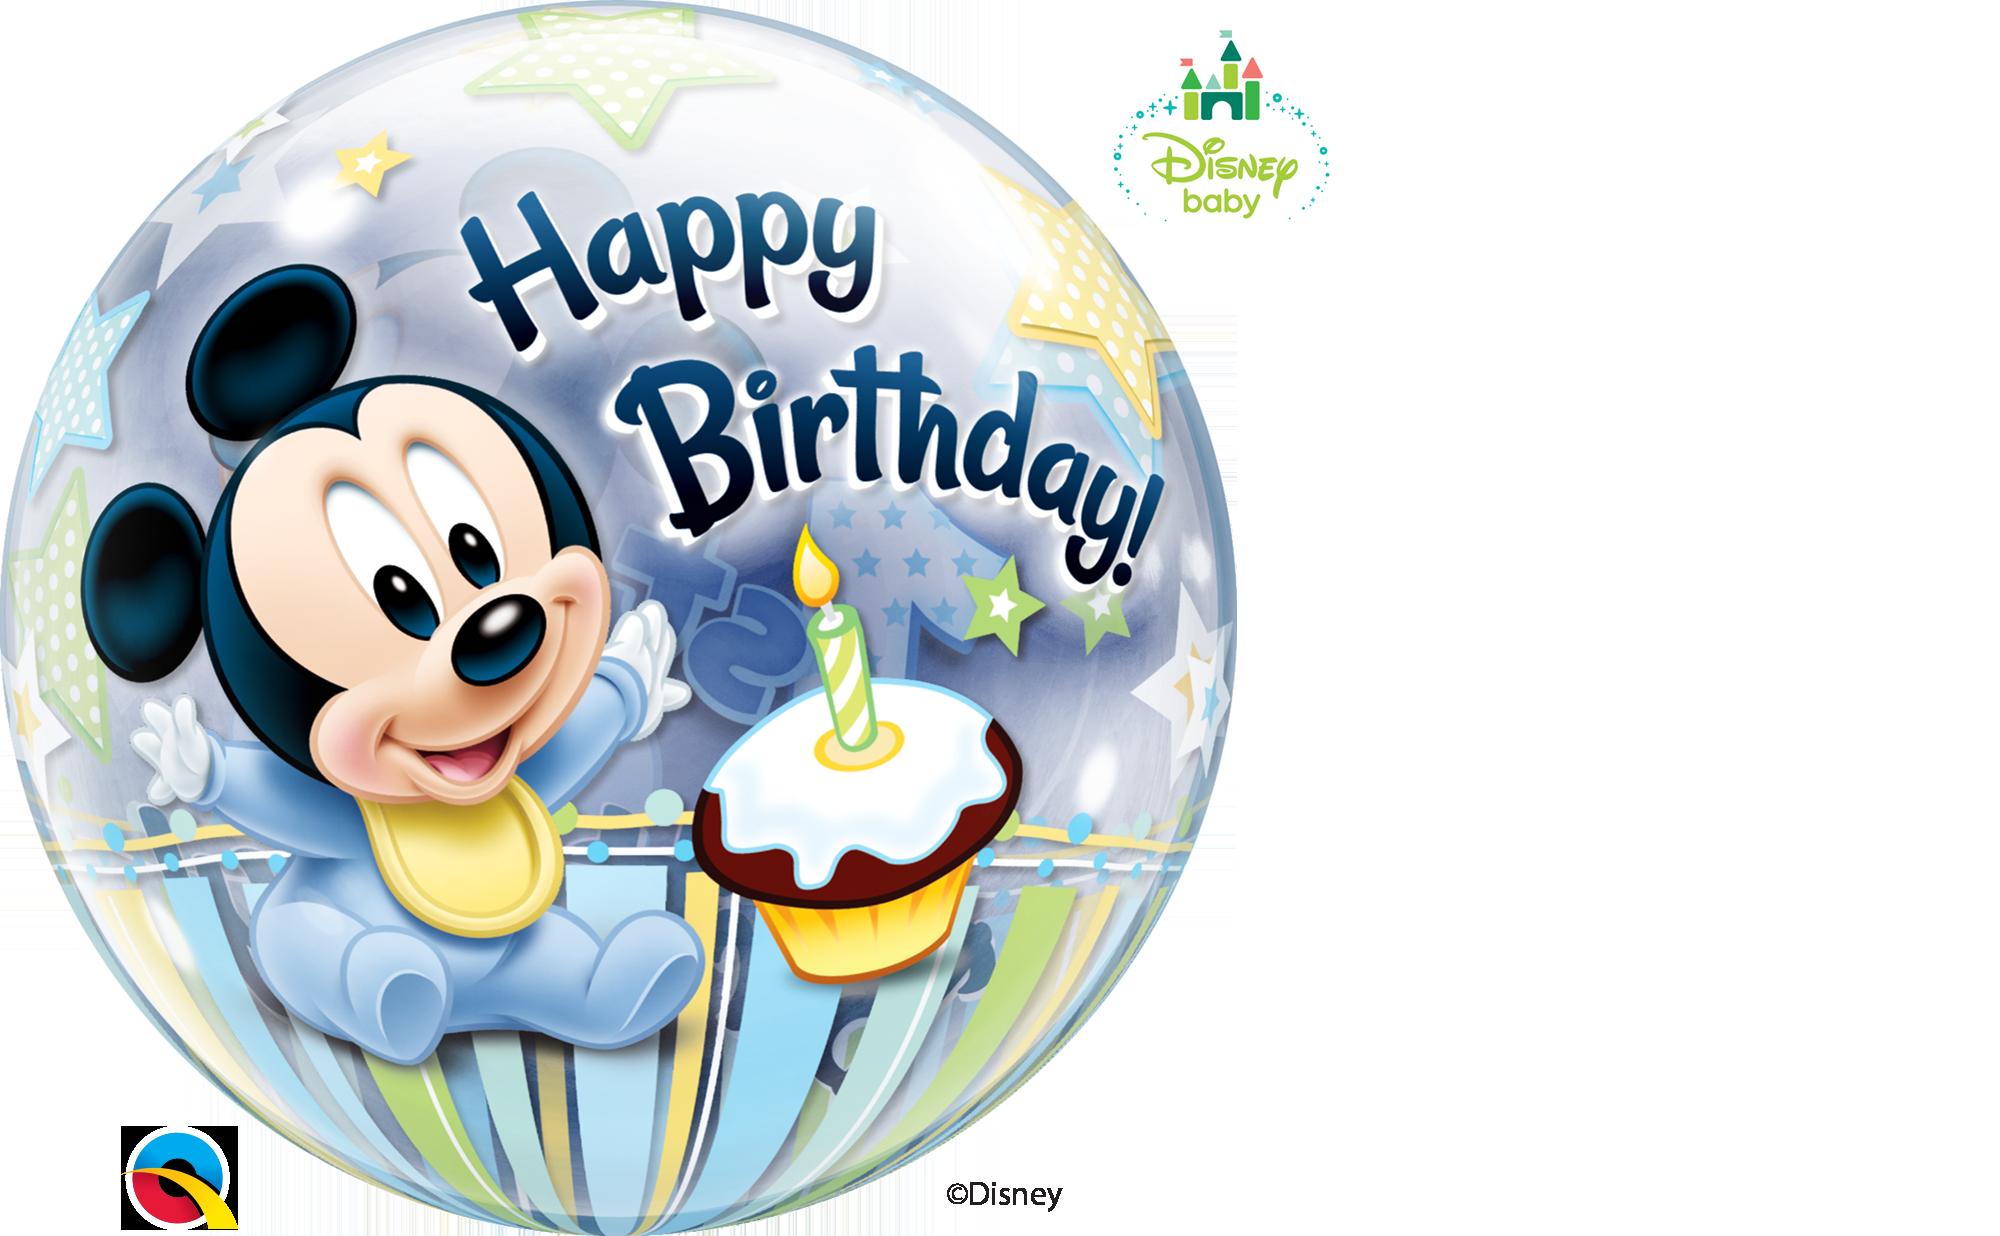 Bubble Ballon Mickey Mouse Zum 1 Geburtstag 56cm Bubble Ballons